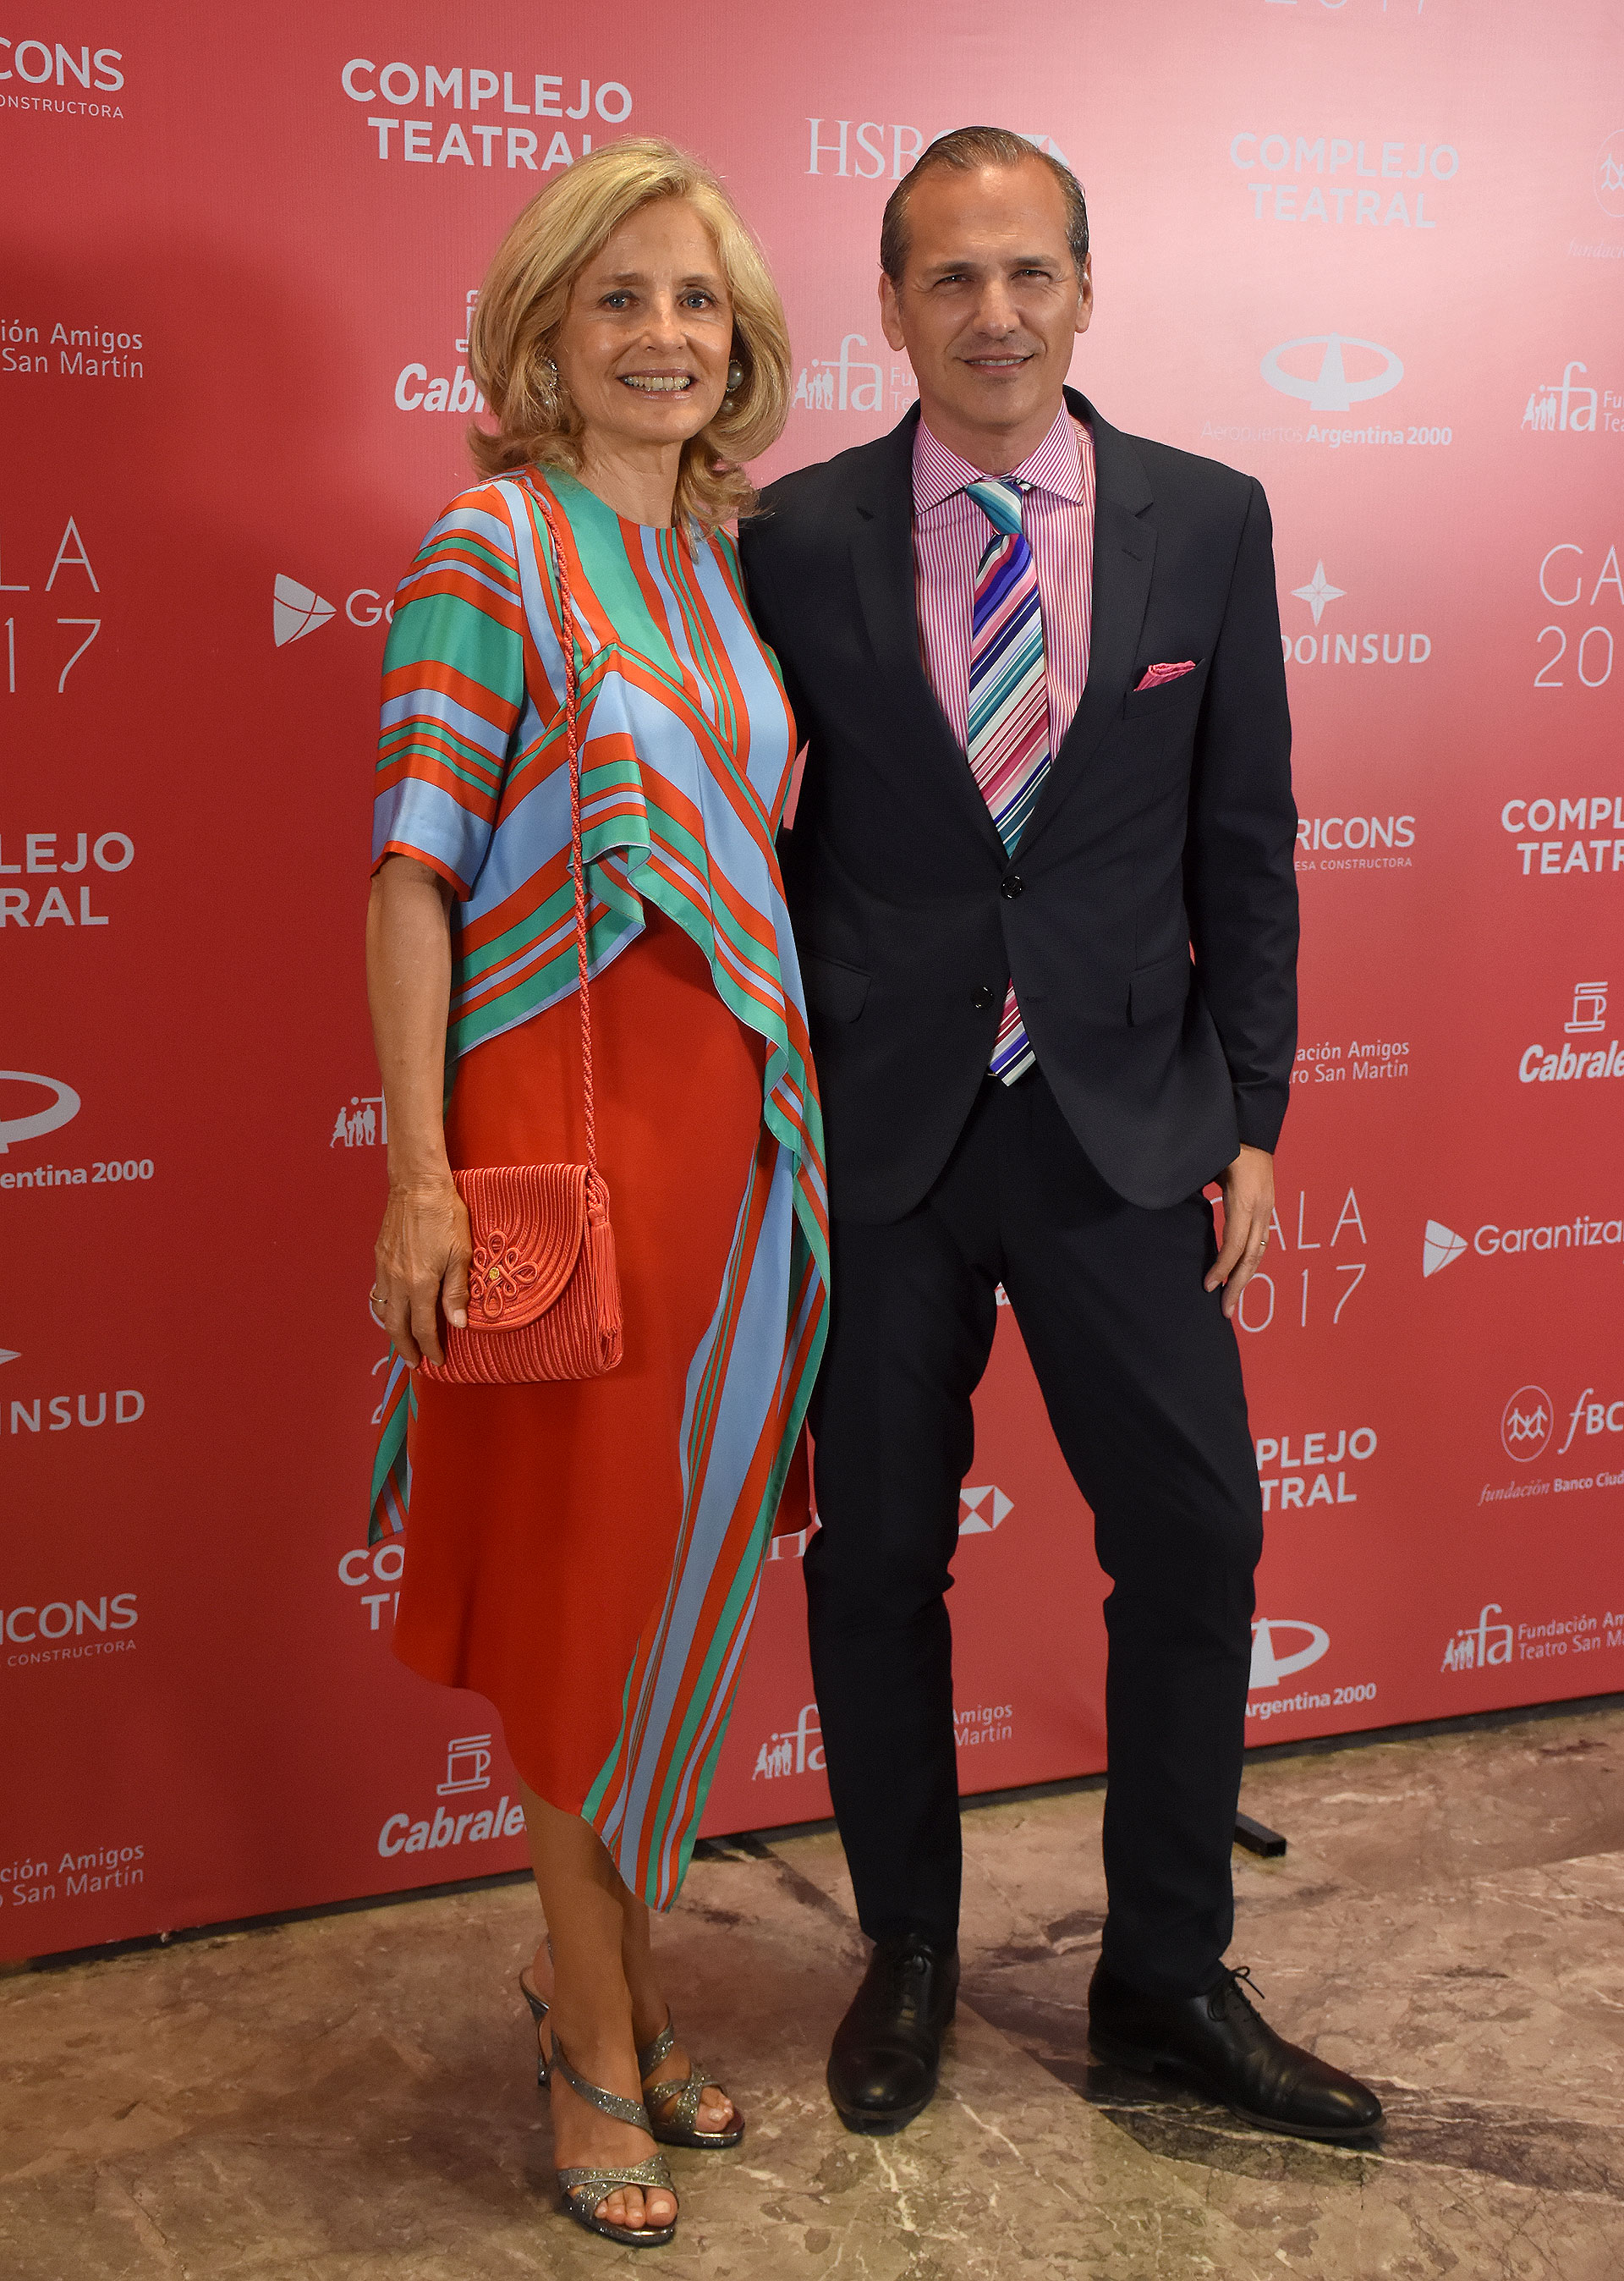 Cecilia Zuberbuhler y Javier Iturrioz